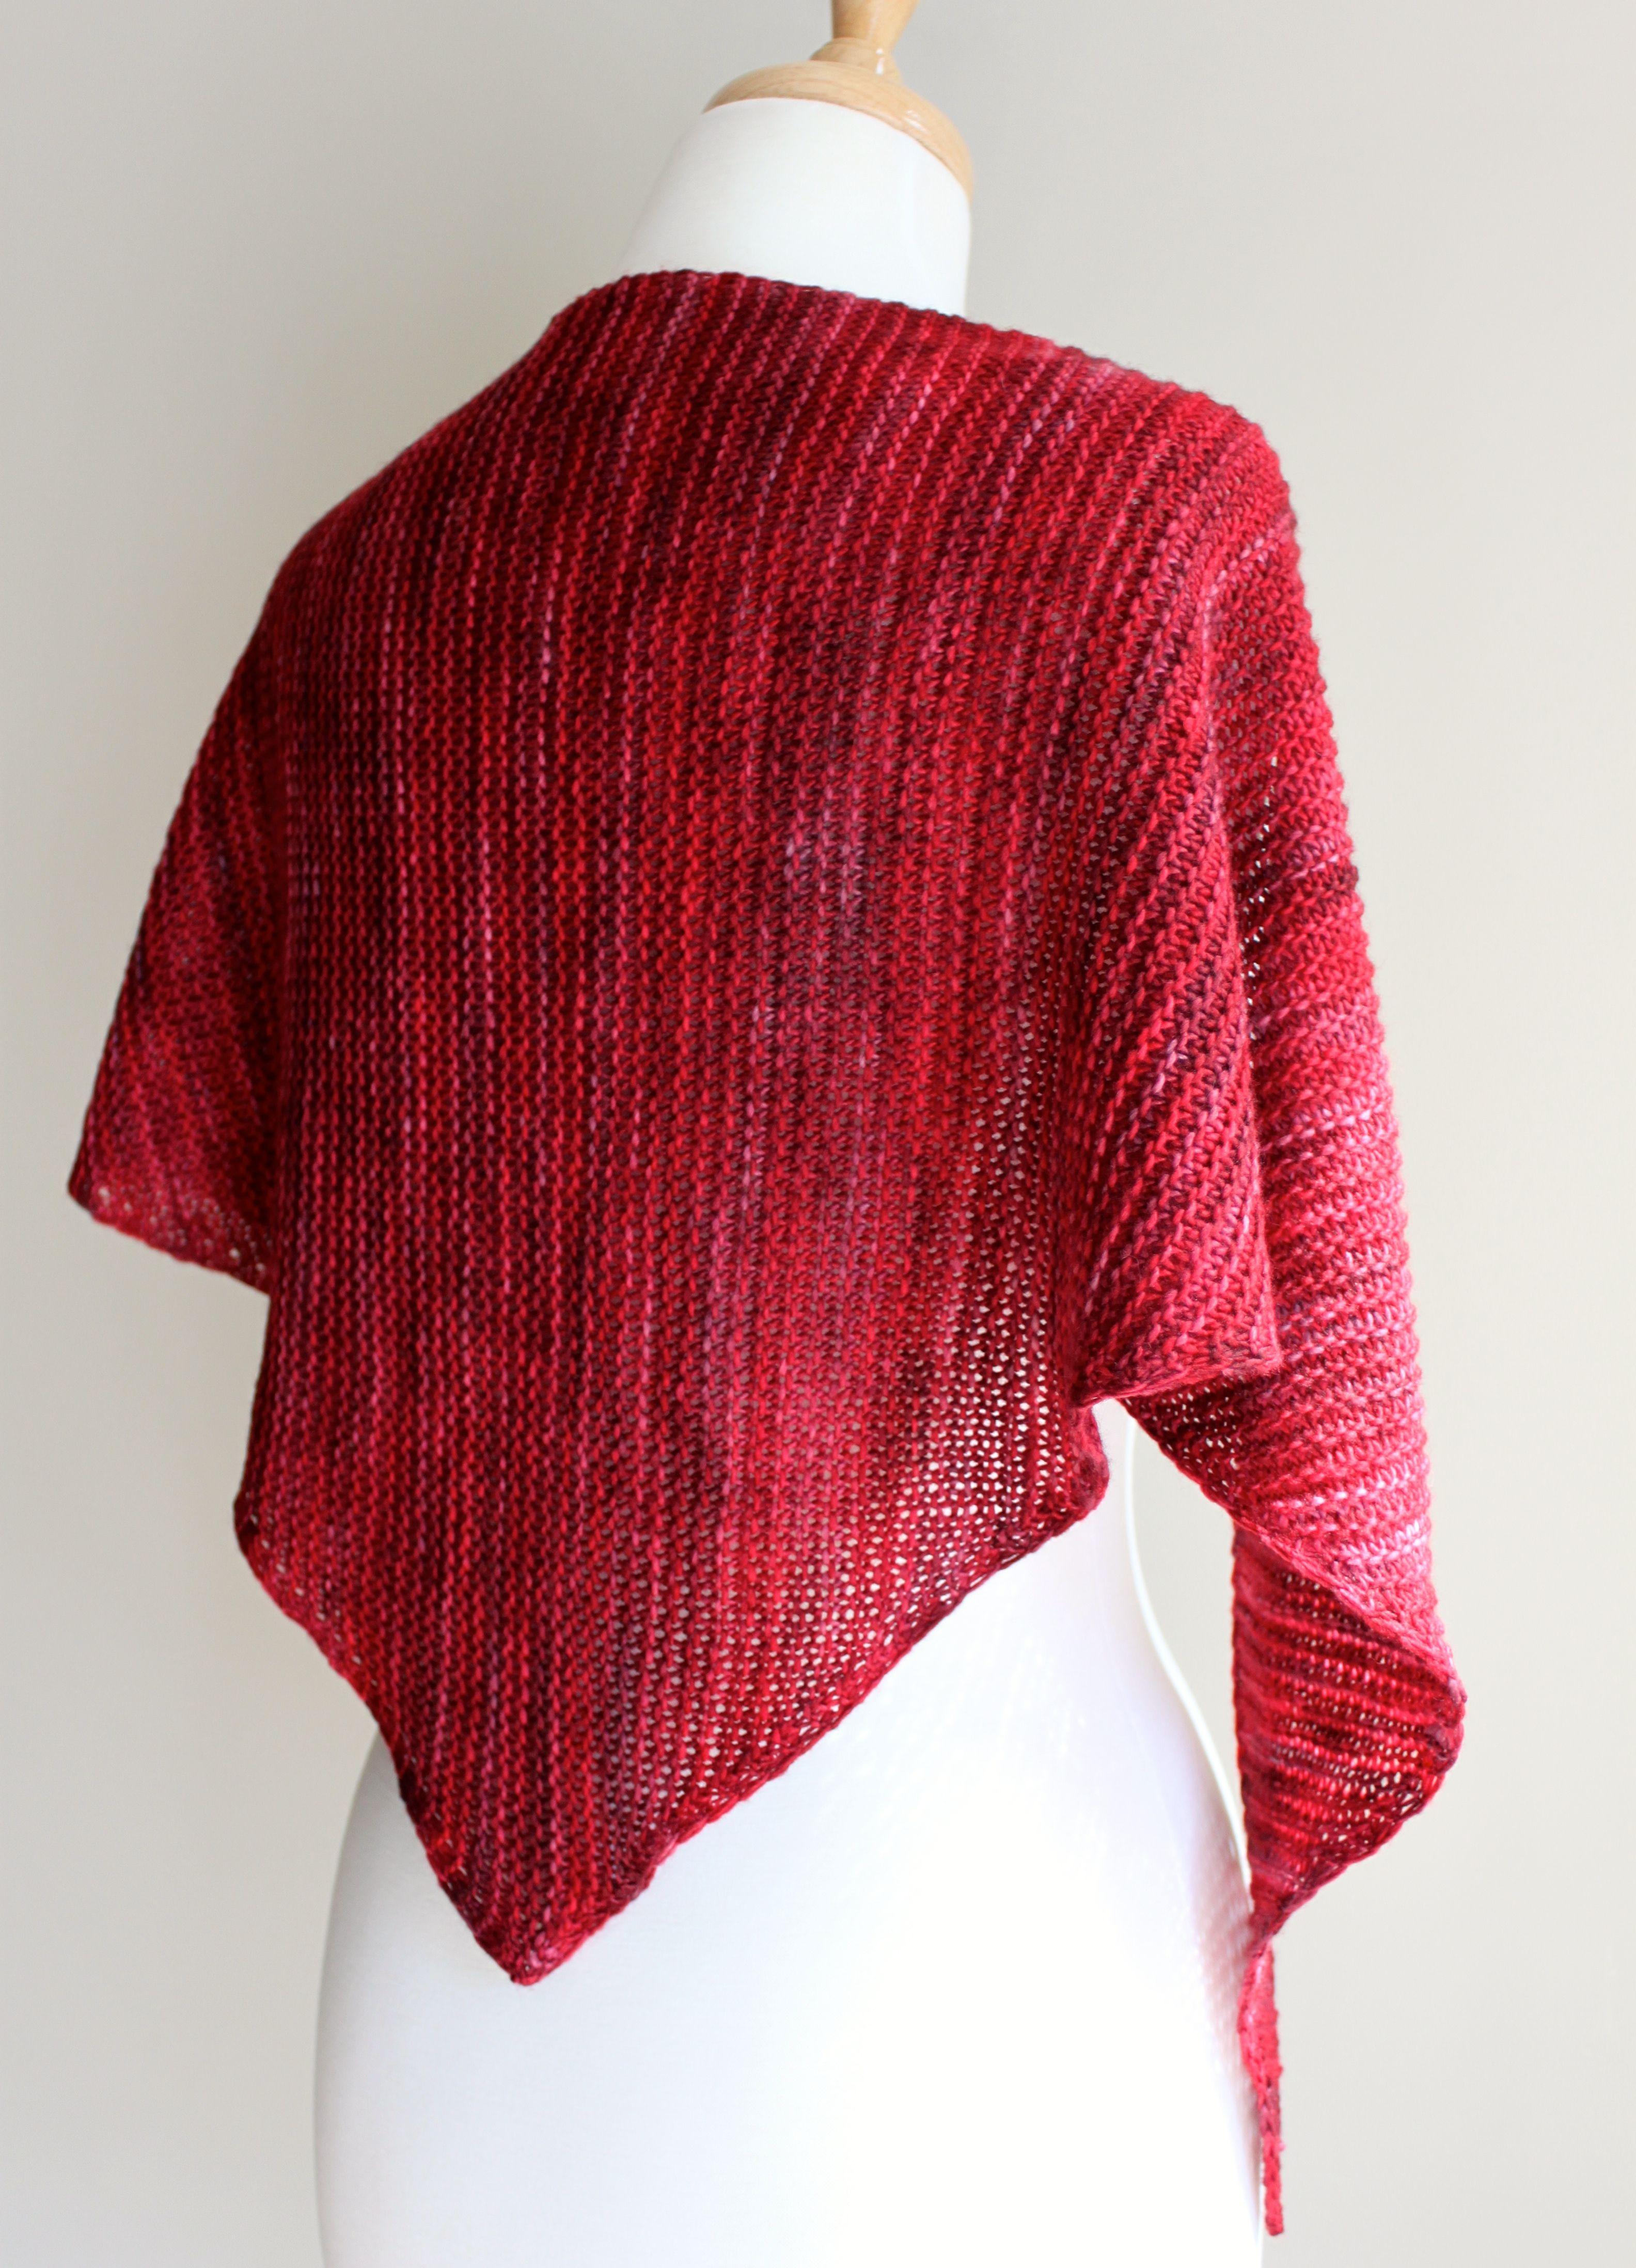 Free knitting patterns truly triangular scarf knitting patterns free knitting patterns truly triangular scarf bankloansurffo Gallery